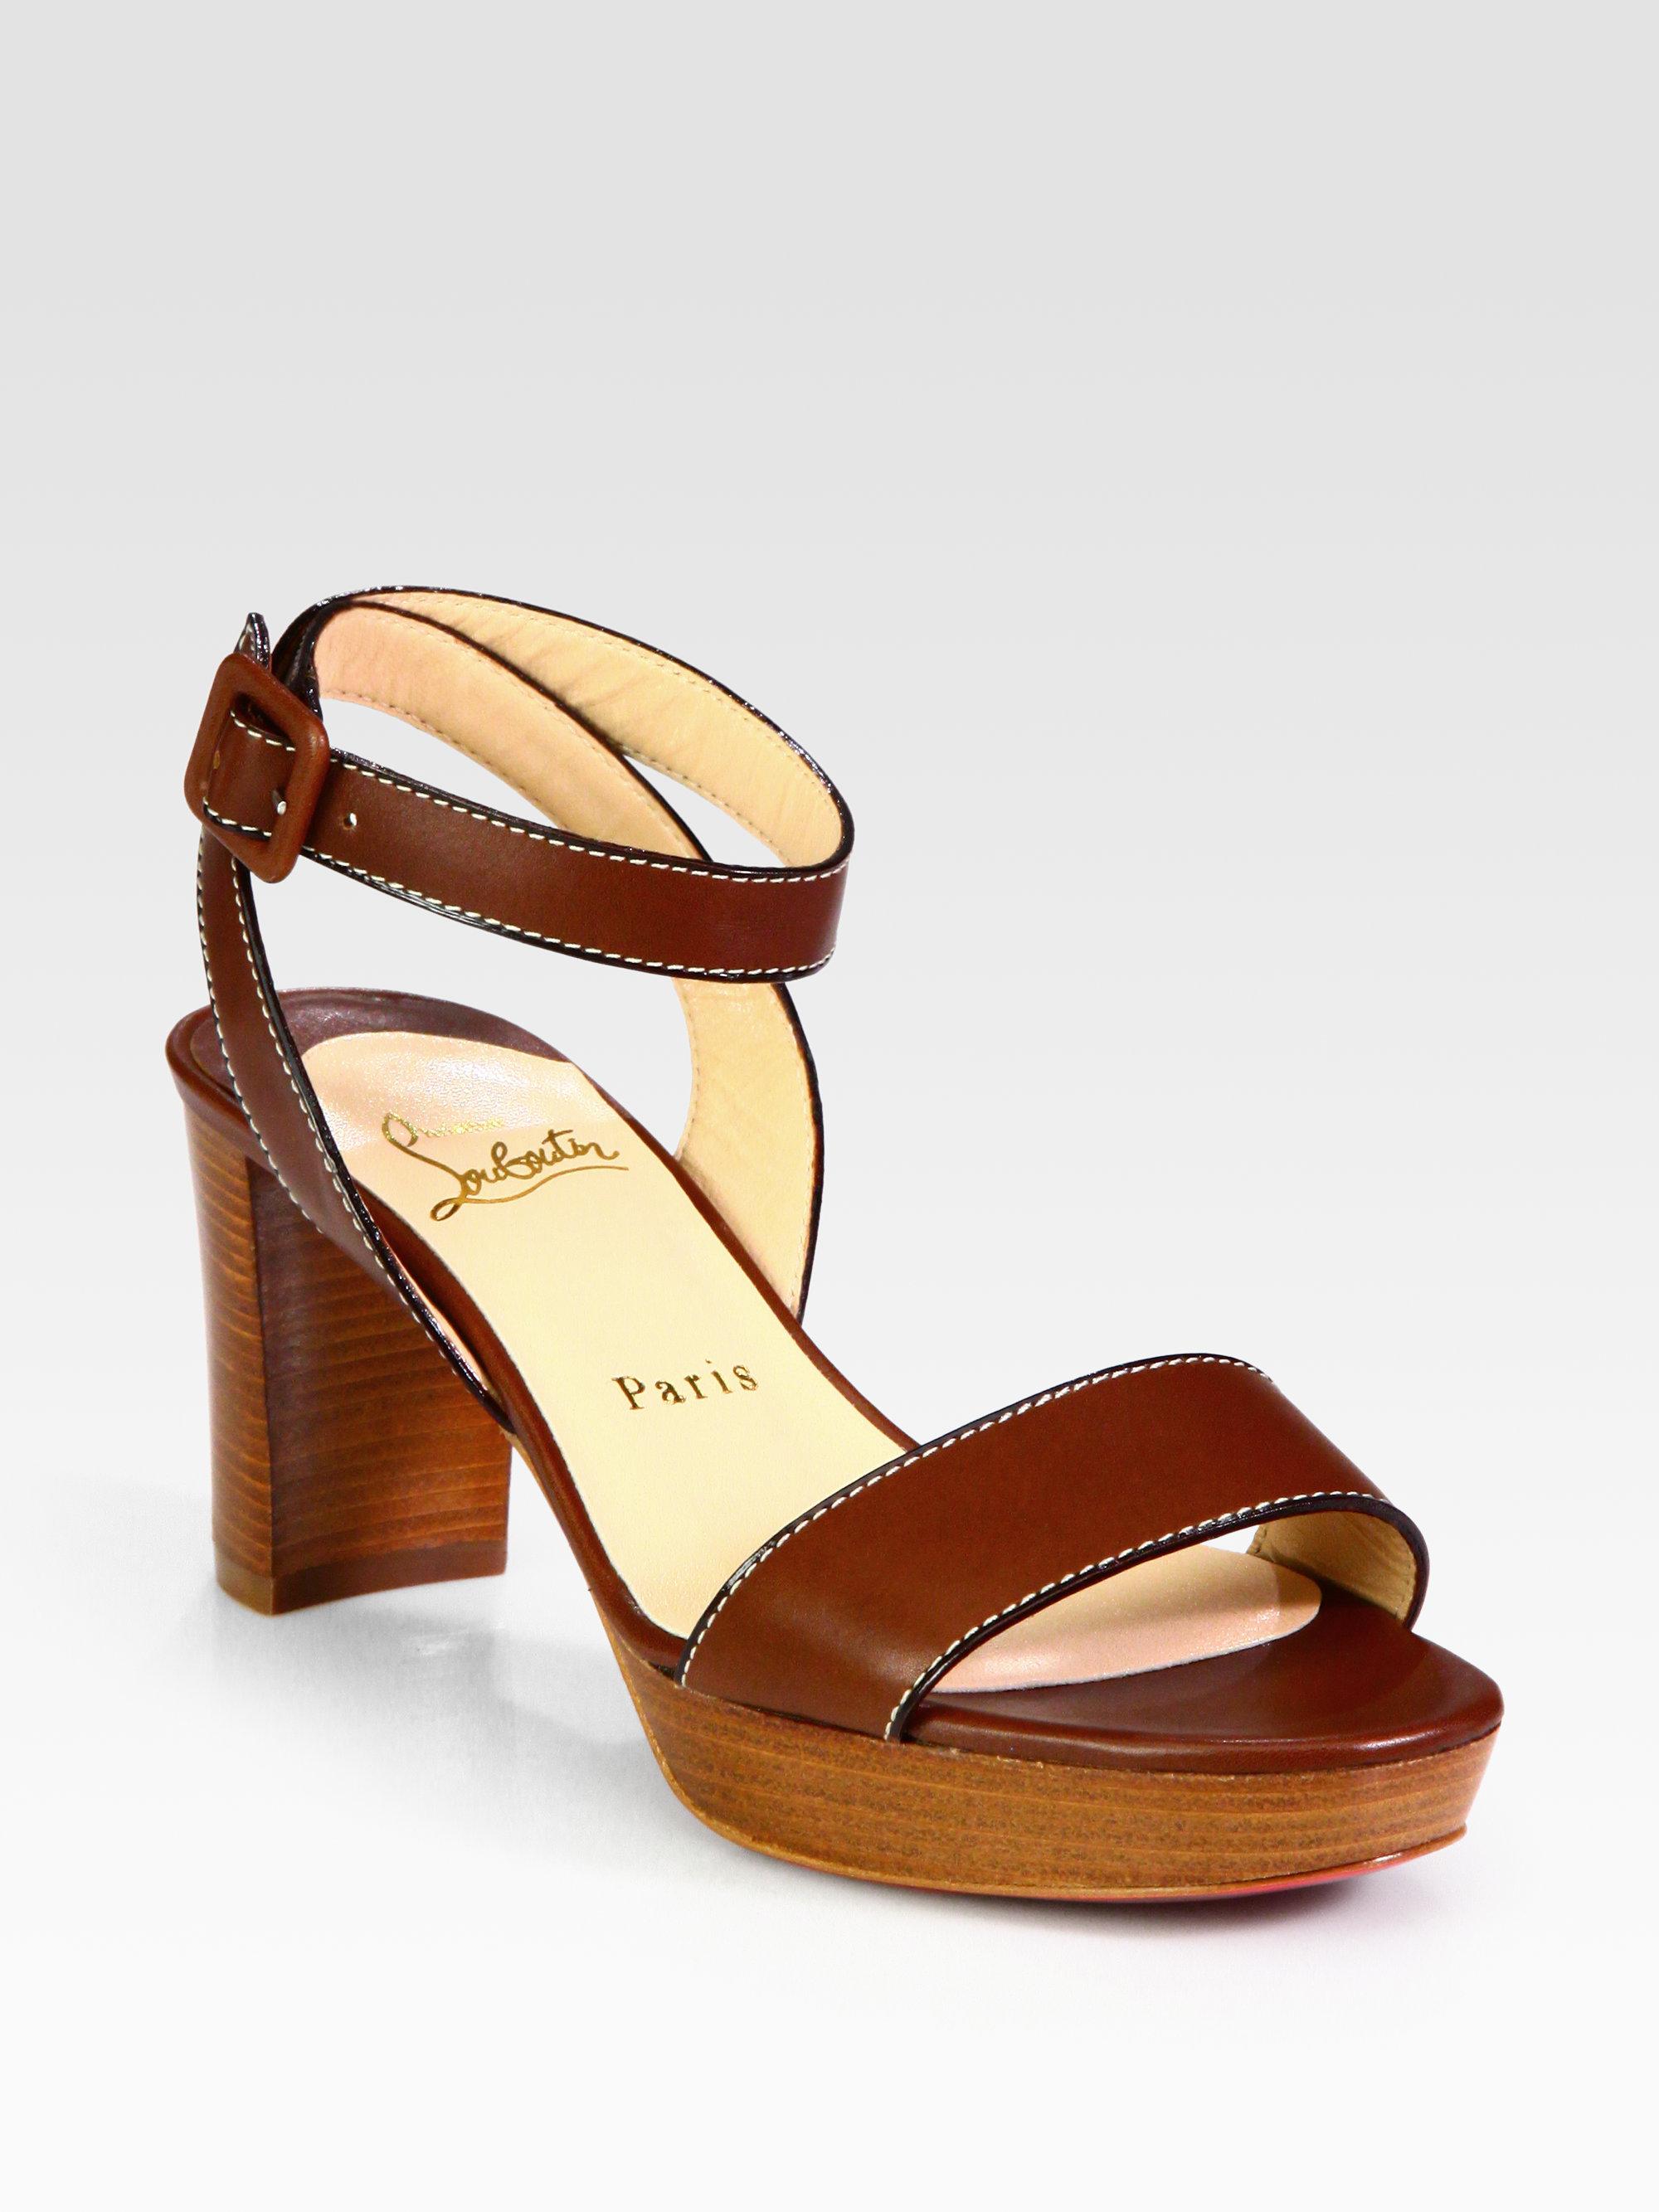 christian louboutin carlota patent platform sandals | Landenberg ...